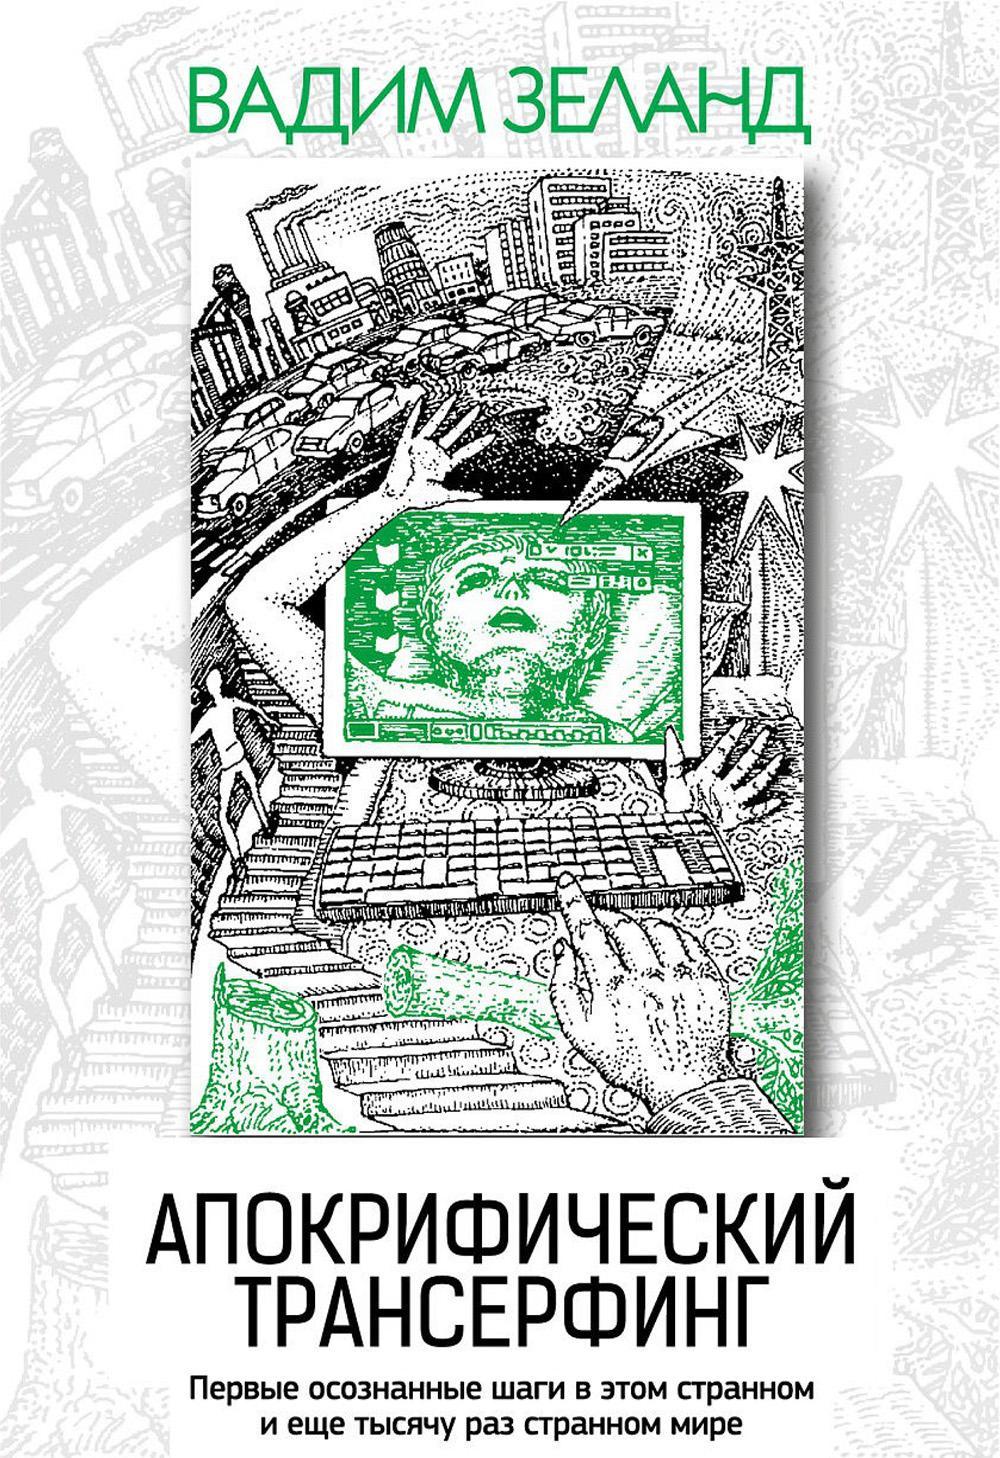 Апокрифический Трансерфинг | Вадим Зеланд | Книга и аудиокнига